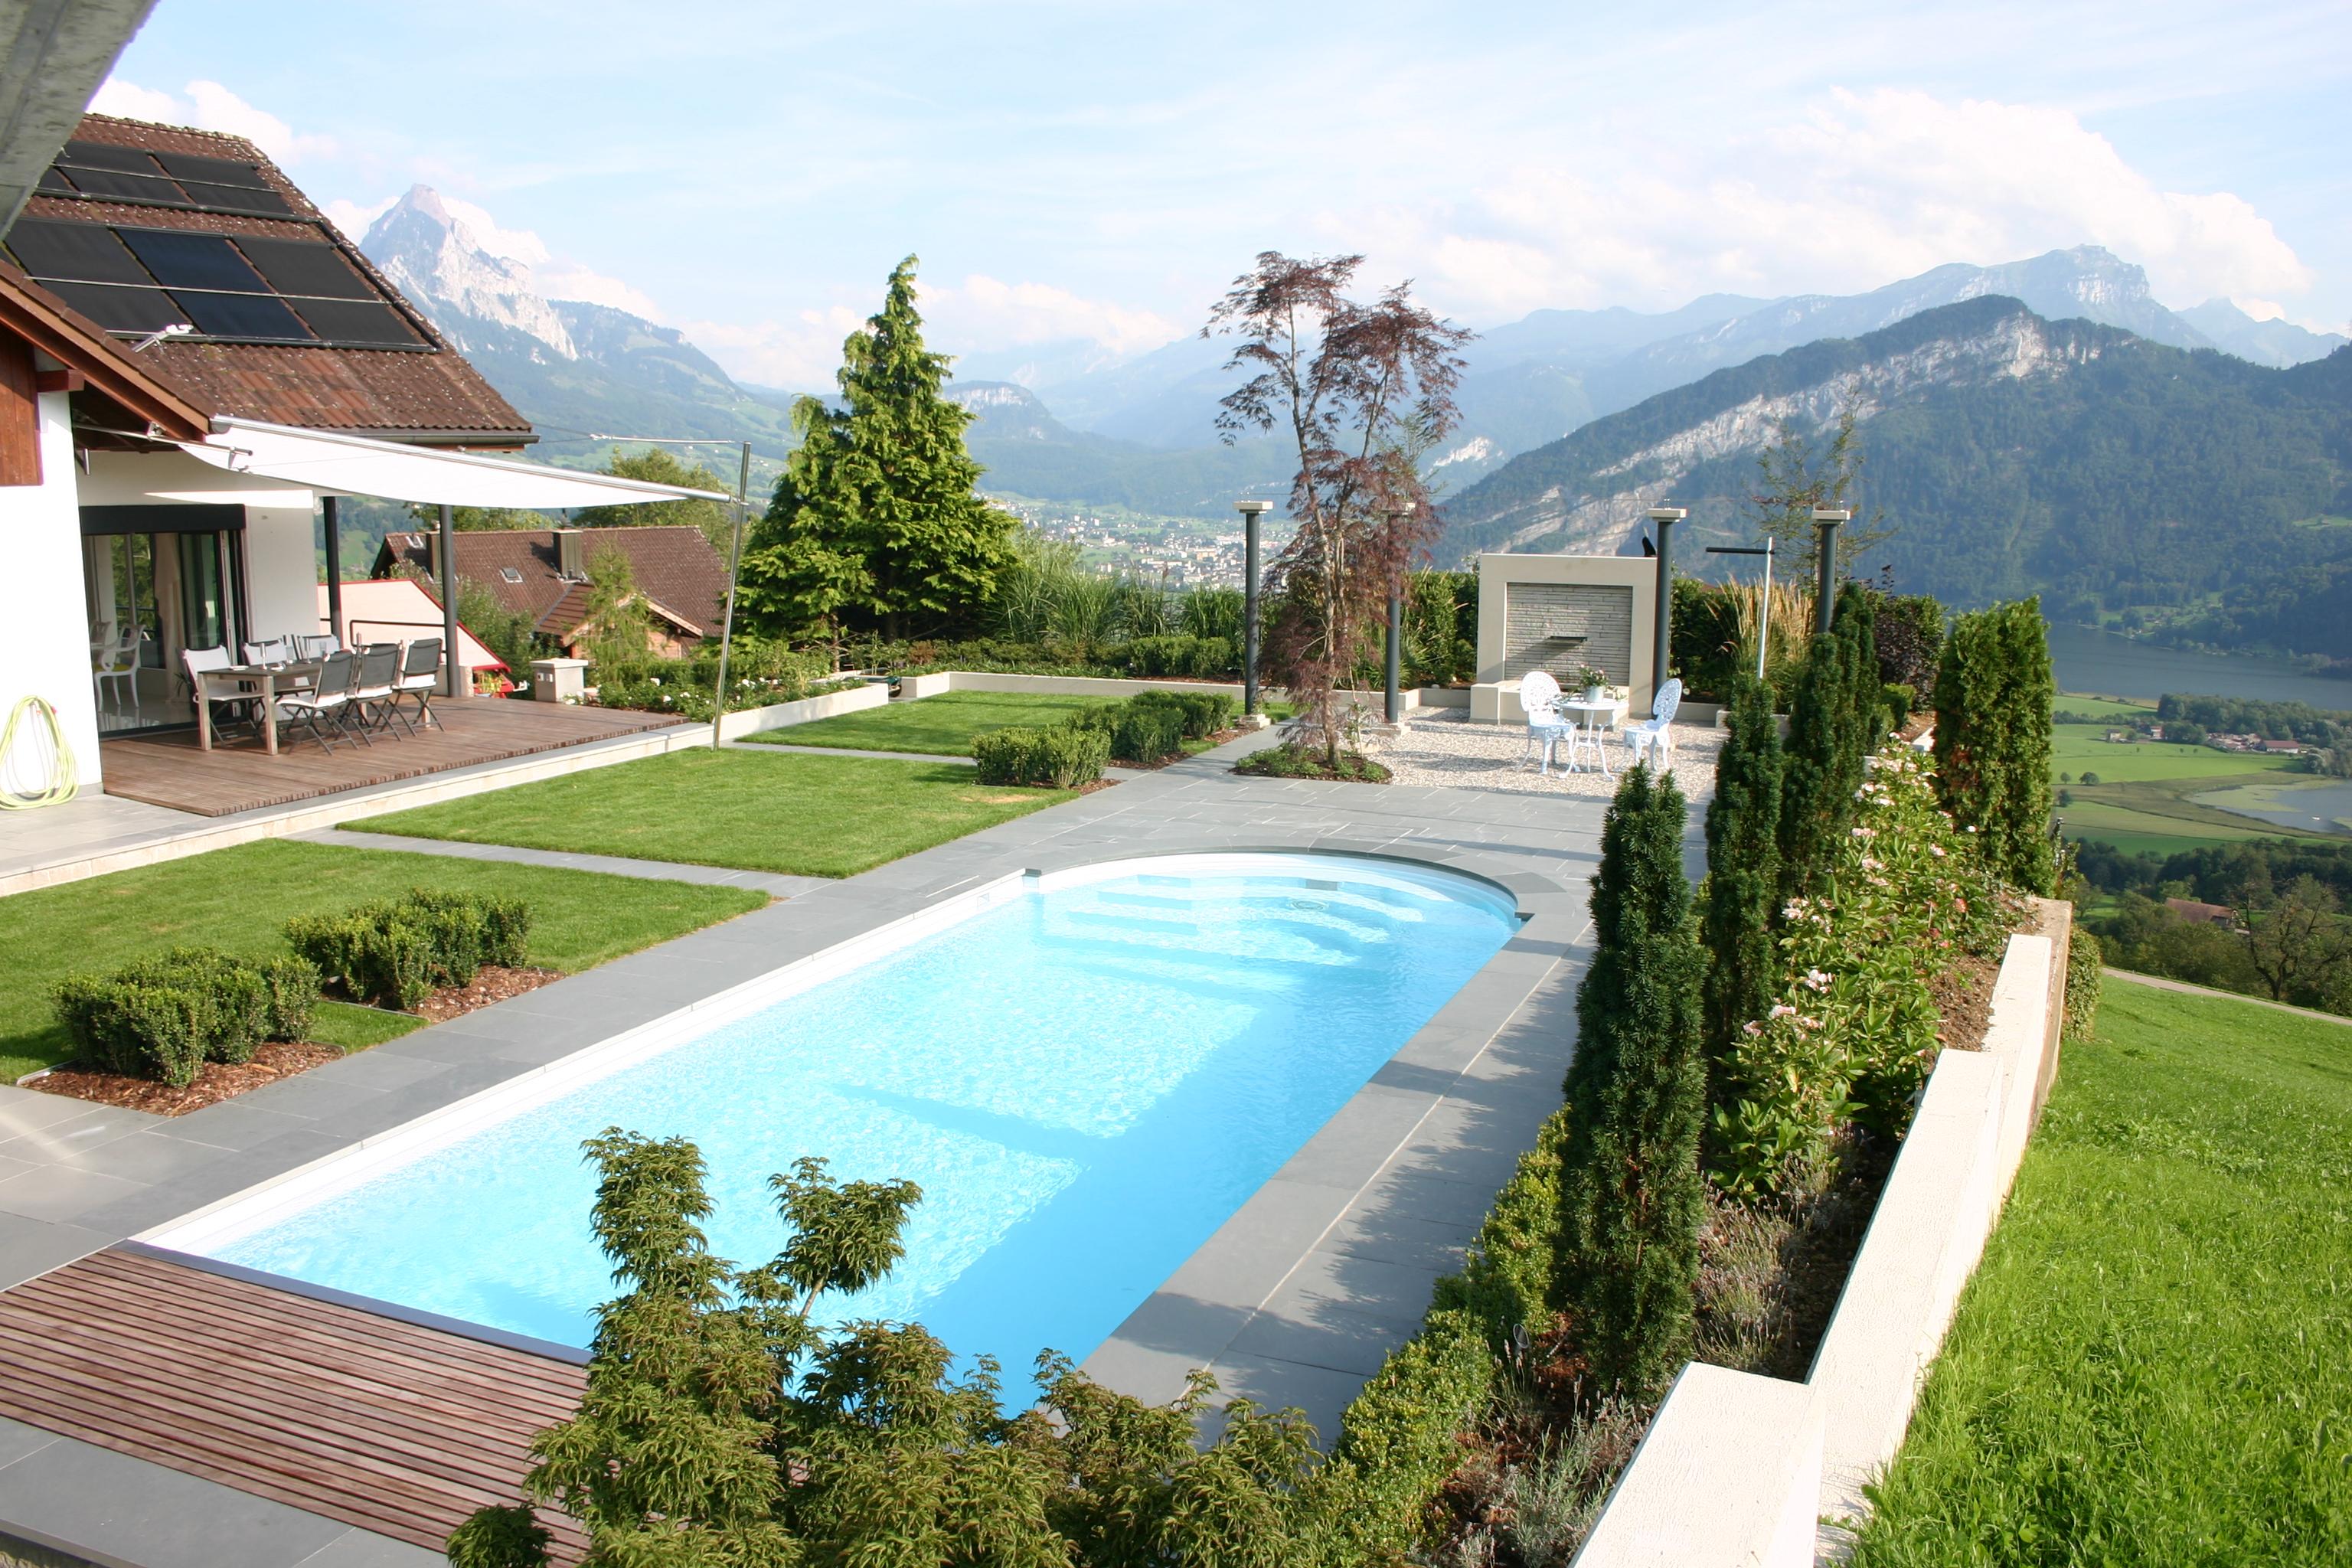 Swimming-Pool mit Chlor